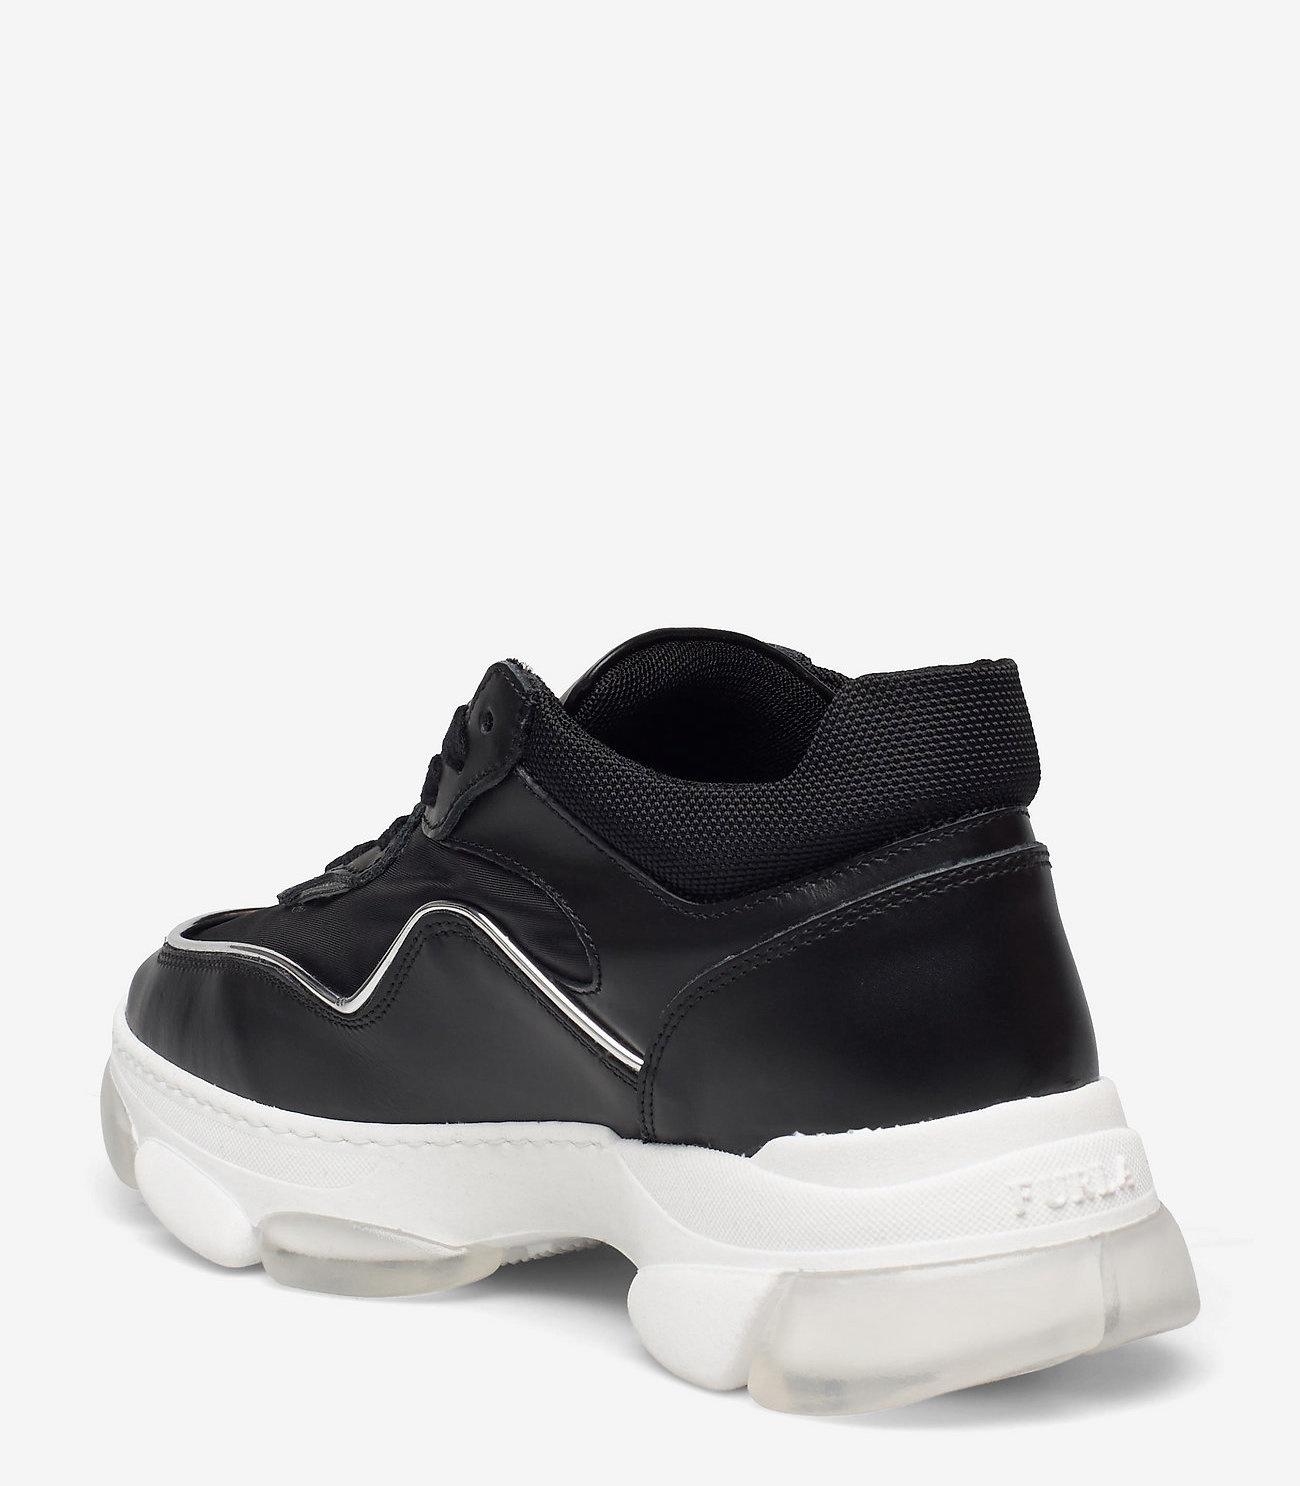 Furla WONDERFURLA Dames sneakers, zwart